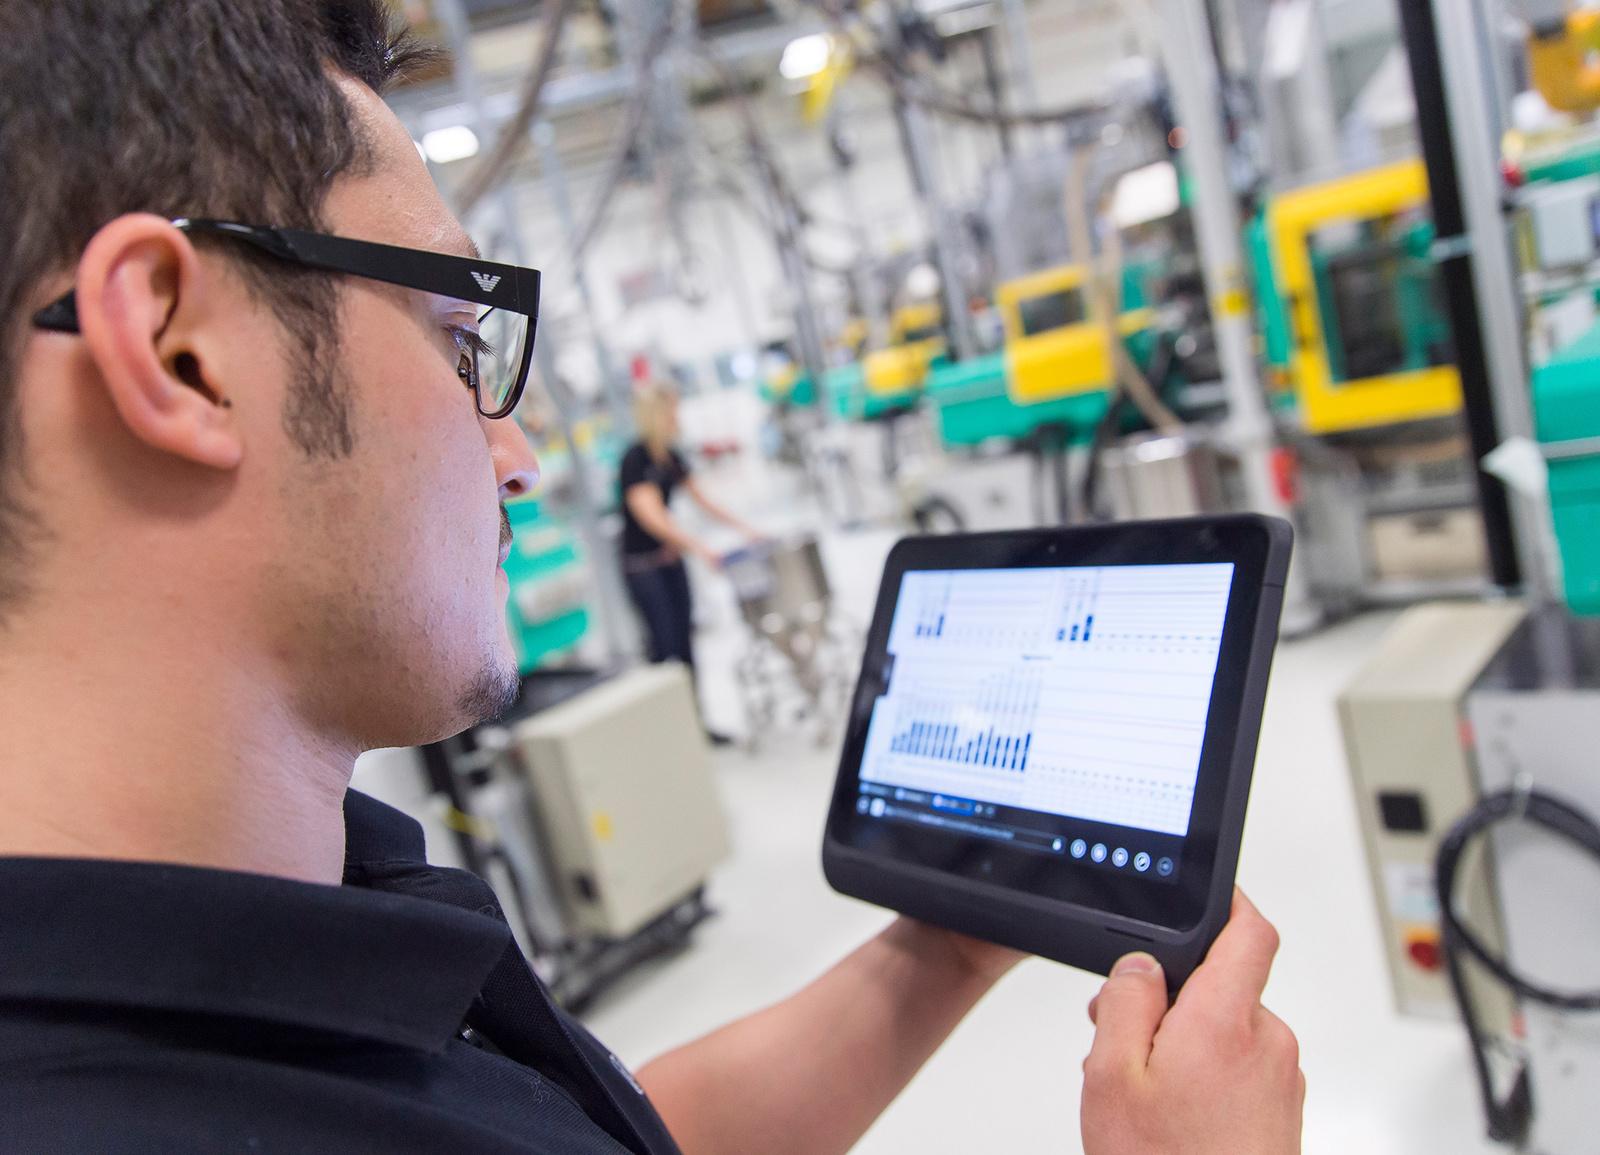 Industrie 4.0 bei Bosch – vernetzte Fertigung